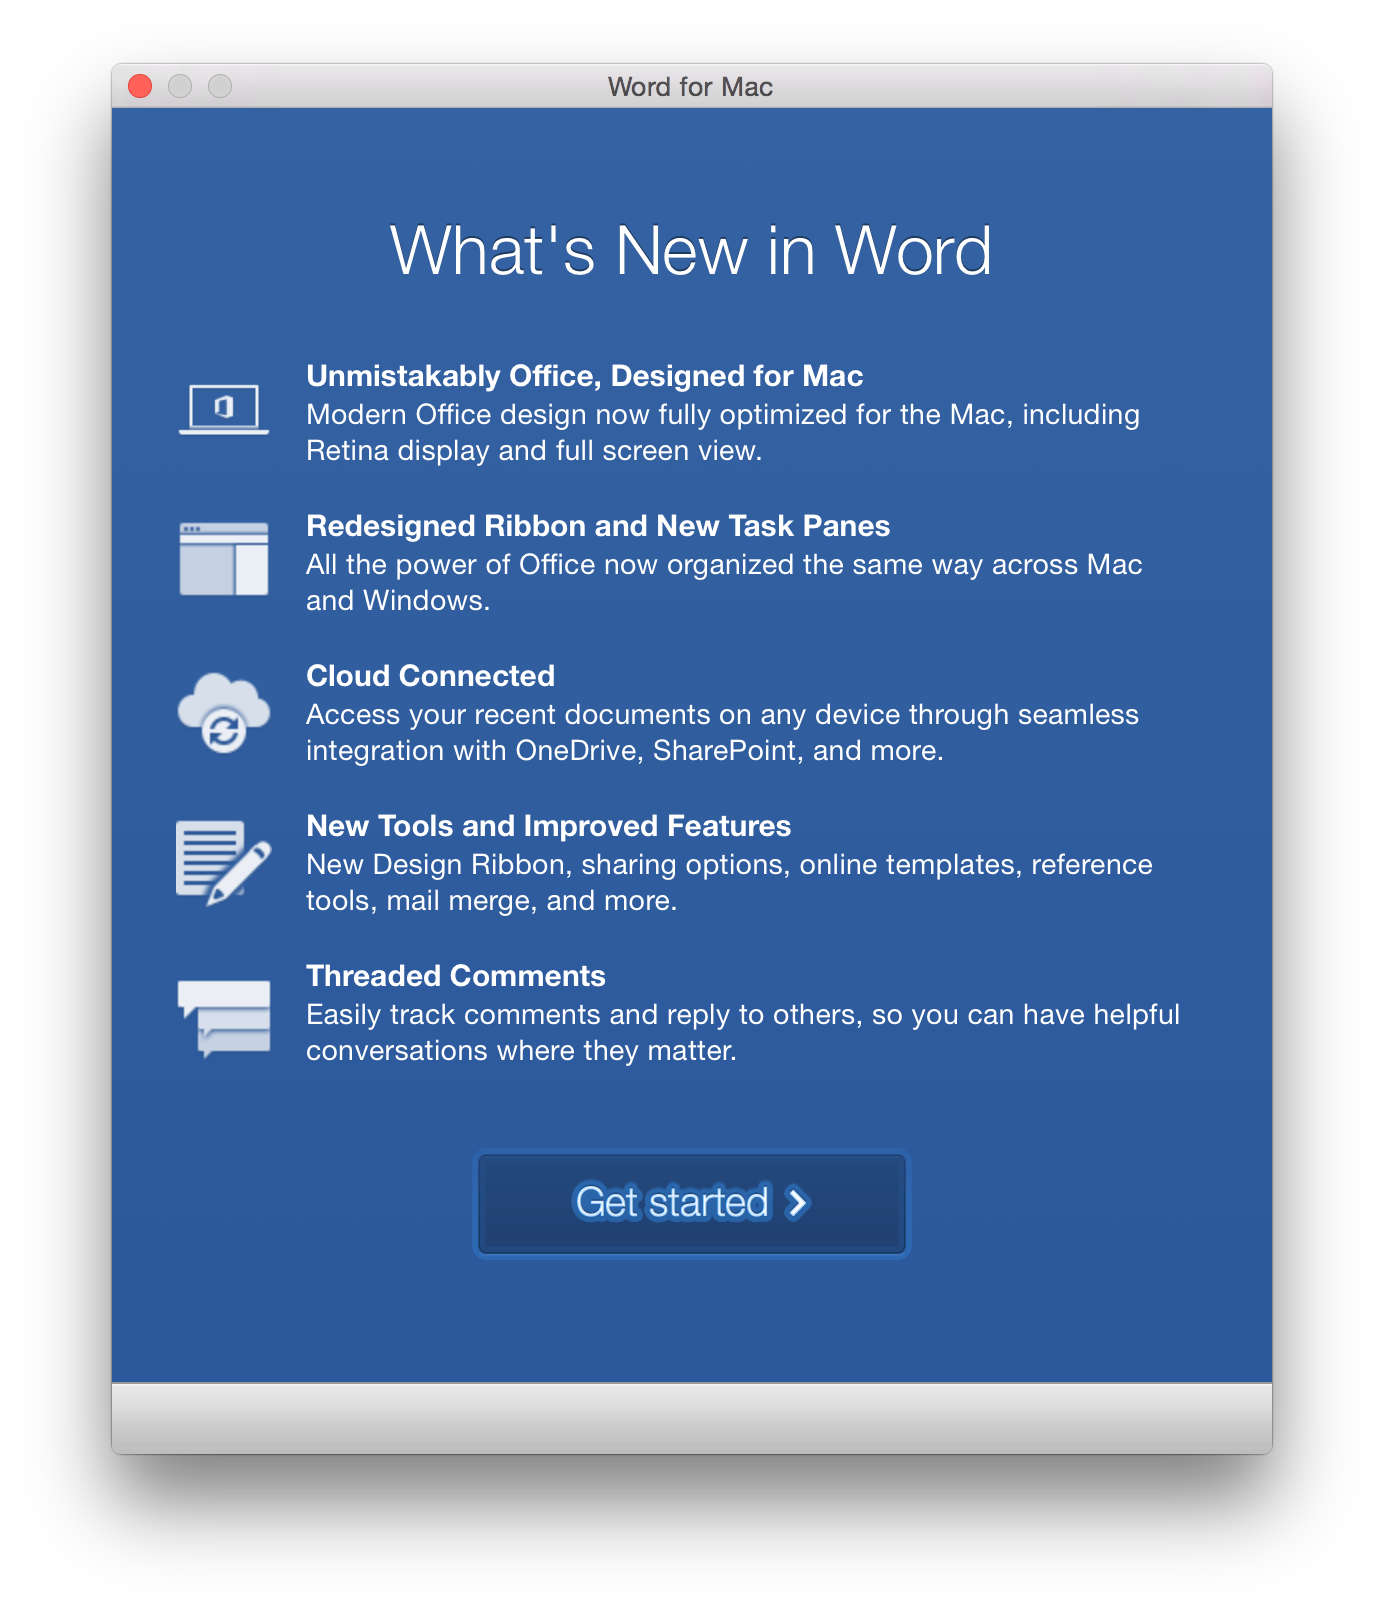 microsoft word 2016 mac download